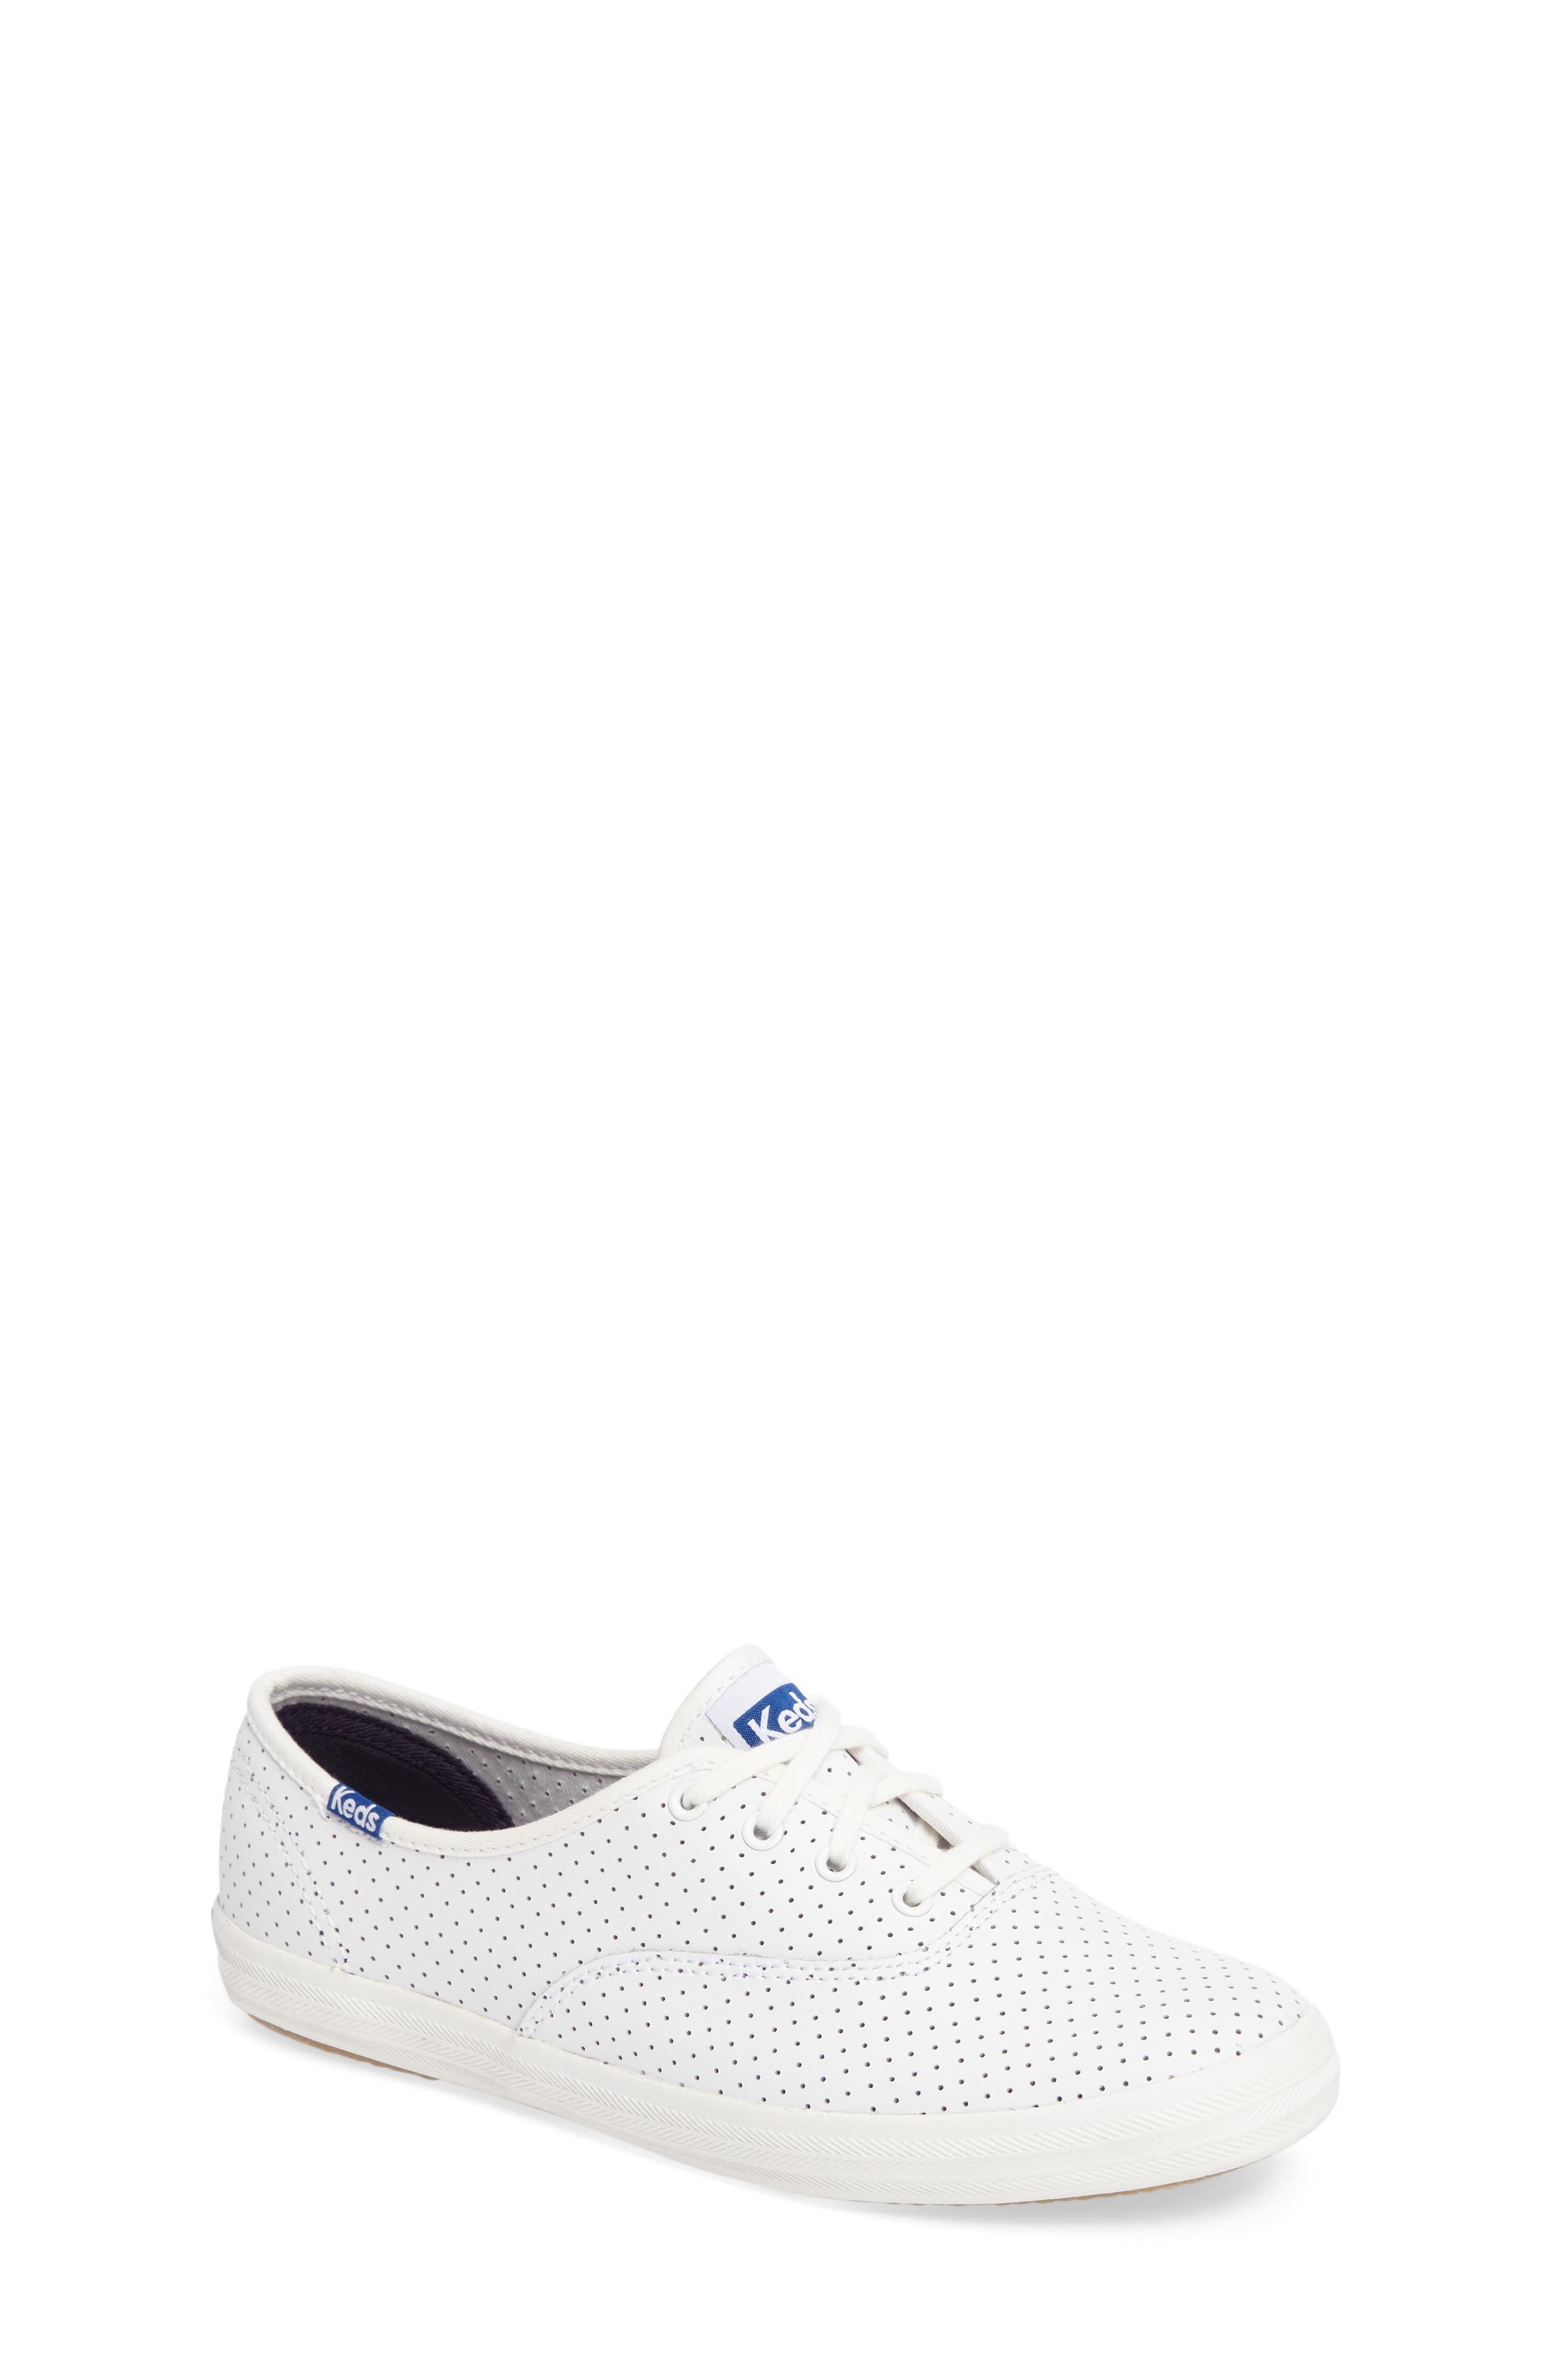 Alternate Image 1 Selected - Keds® Champion Perforated Sneaker (Women)